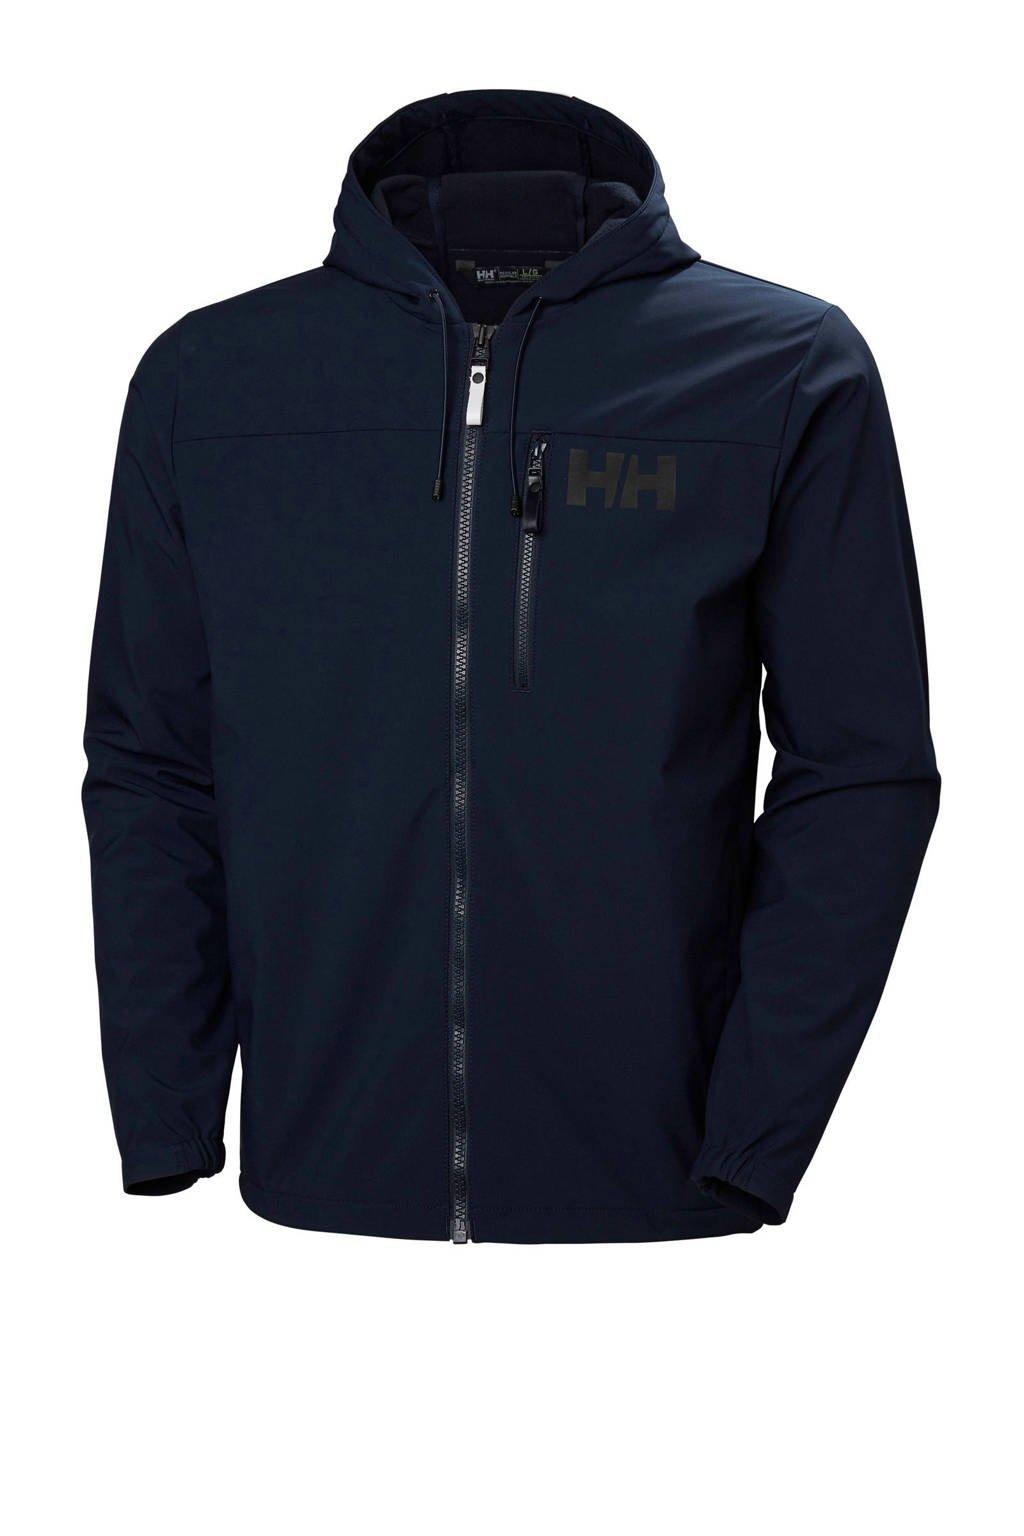 Helly Hansen softshell jas donkerblauw, Donkerblauw